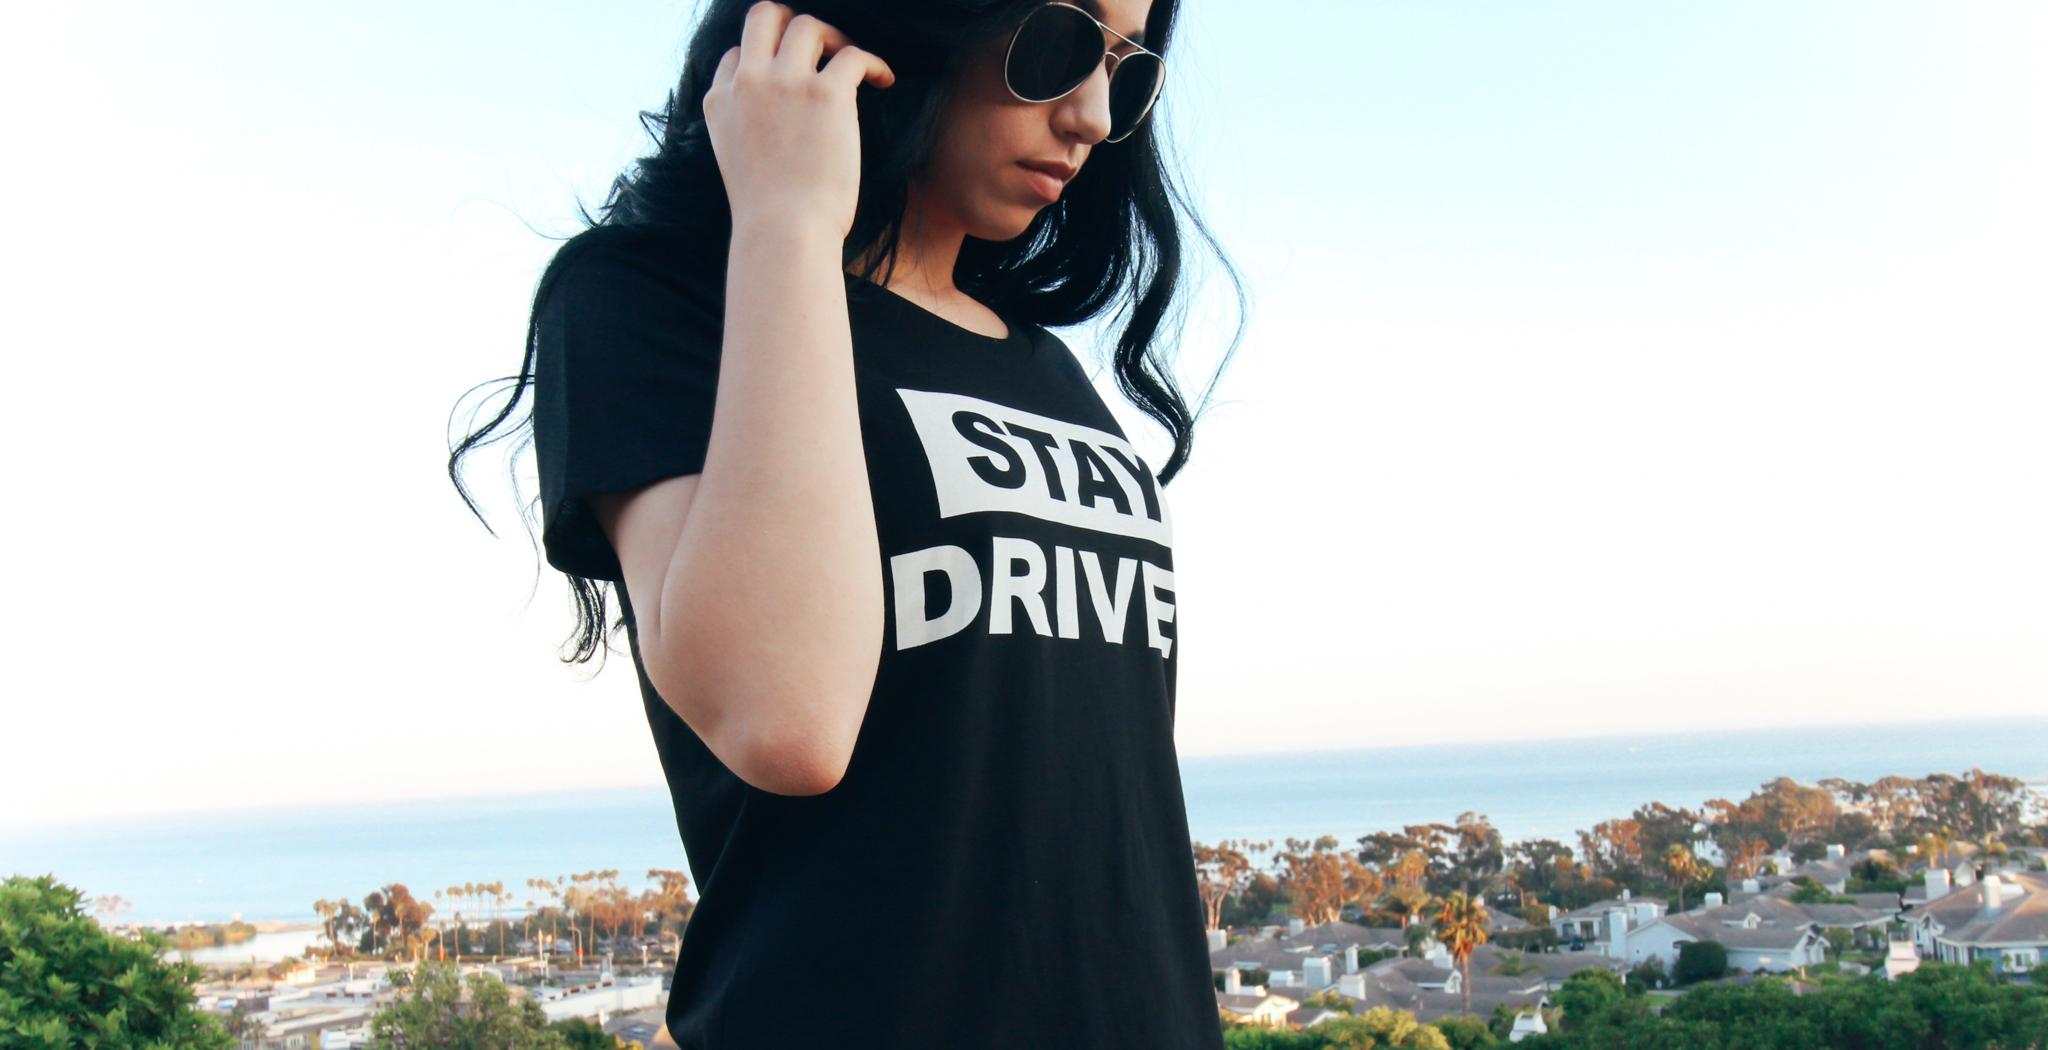 Stay_Driven_Lookbook_Michelle-10.jpg